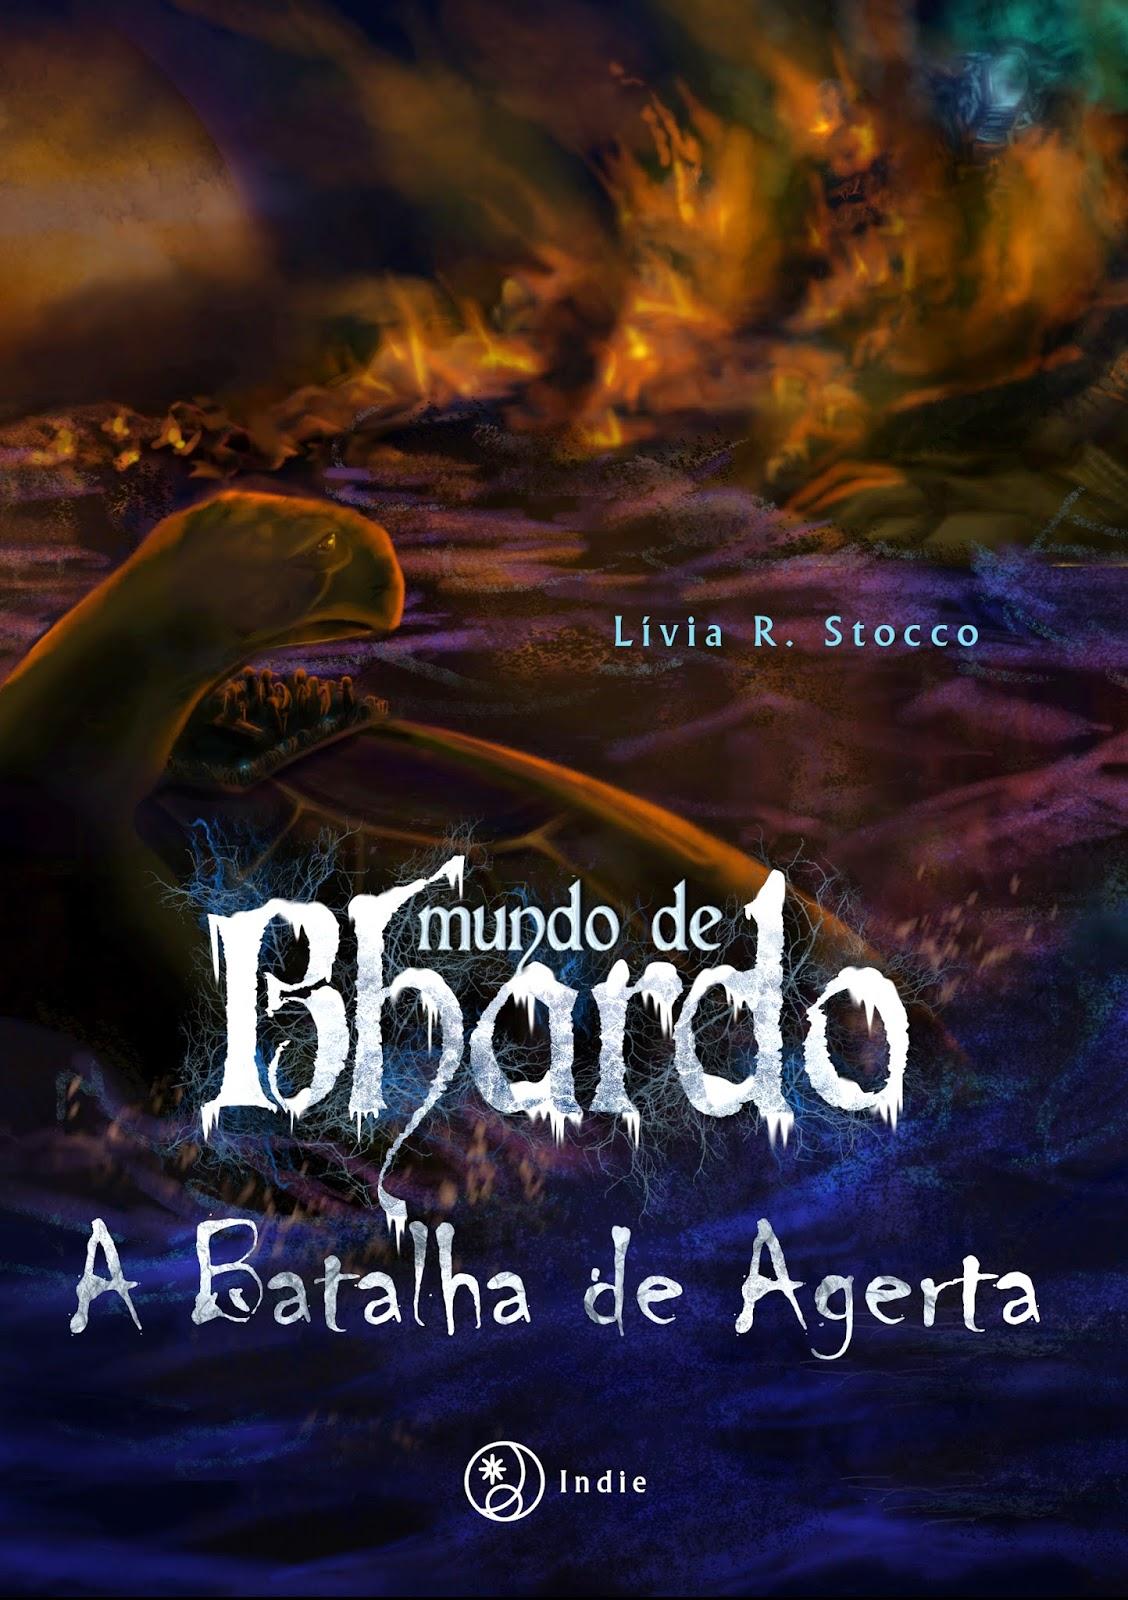 http://www.amazon.com.br/Batalha-Agerta-Mundo-Bhardo-ebook/dp/B00IKA92PQ/ref=sr_1_1?ie=UTF8&qid=1418757559&sr=8-1&keywords=a+batalha+de+agerta